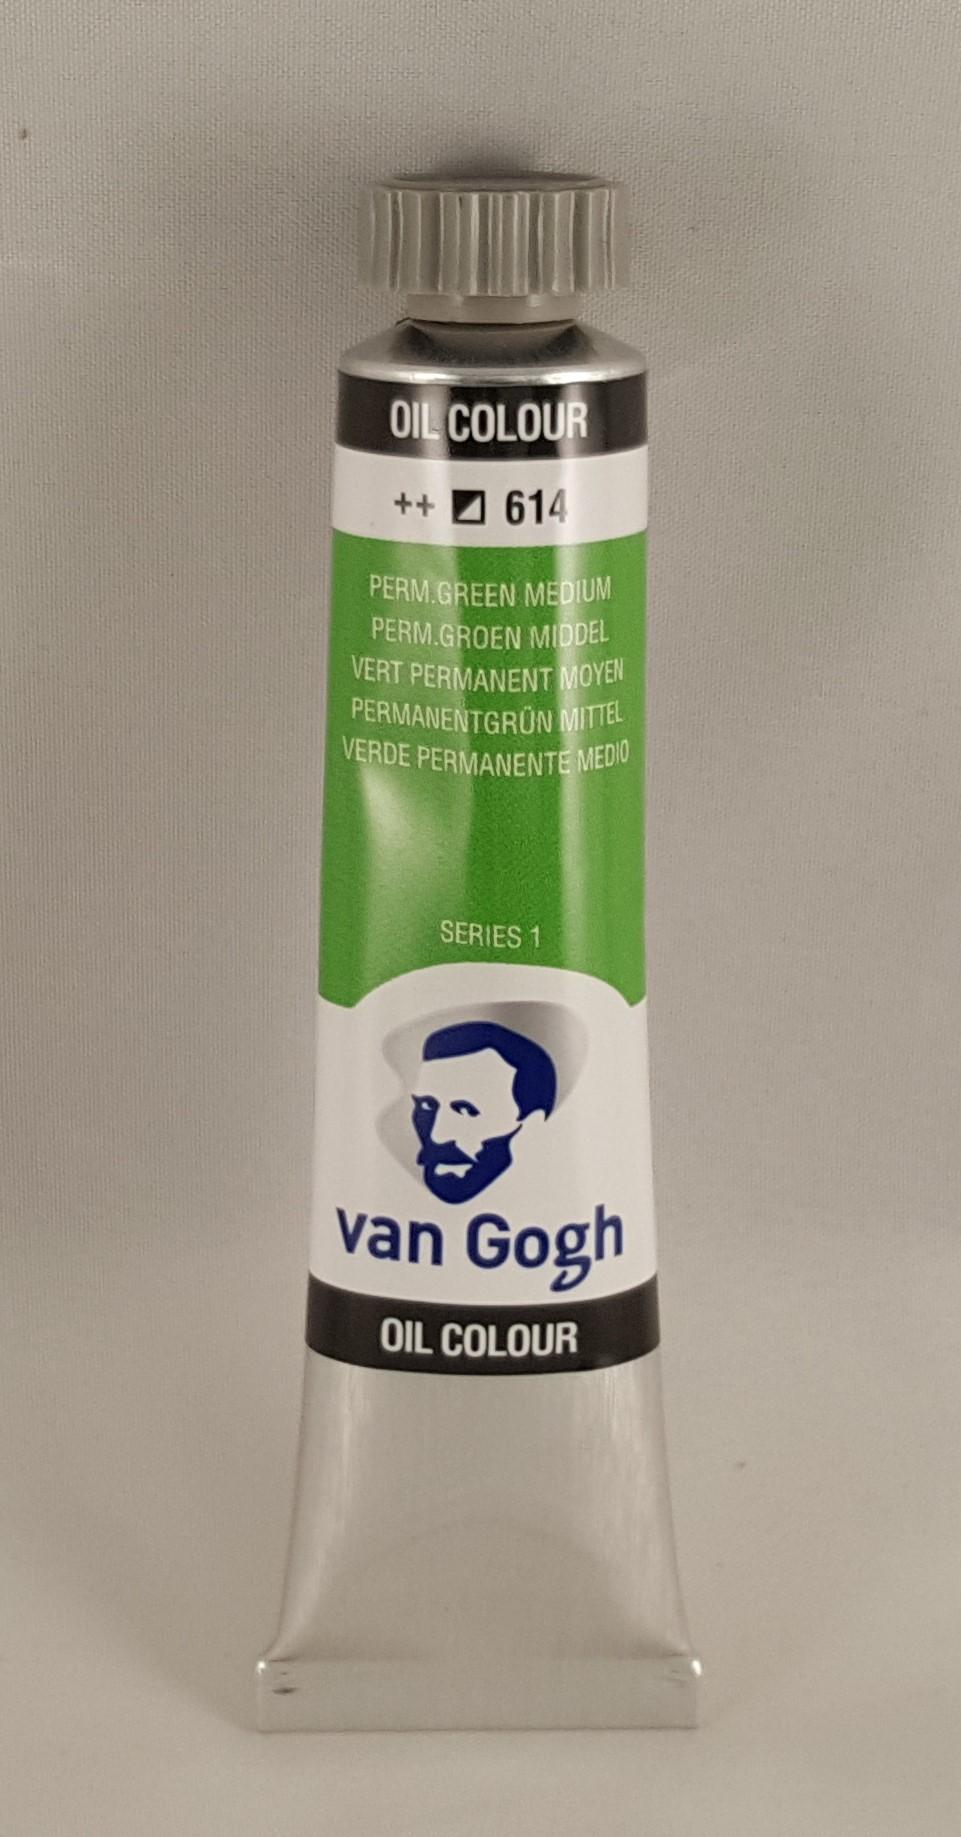 Tinta de óleo Van Gogh perm. green medium